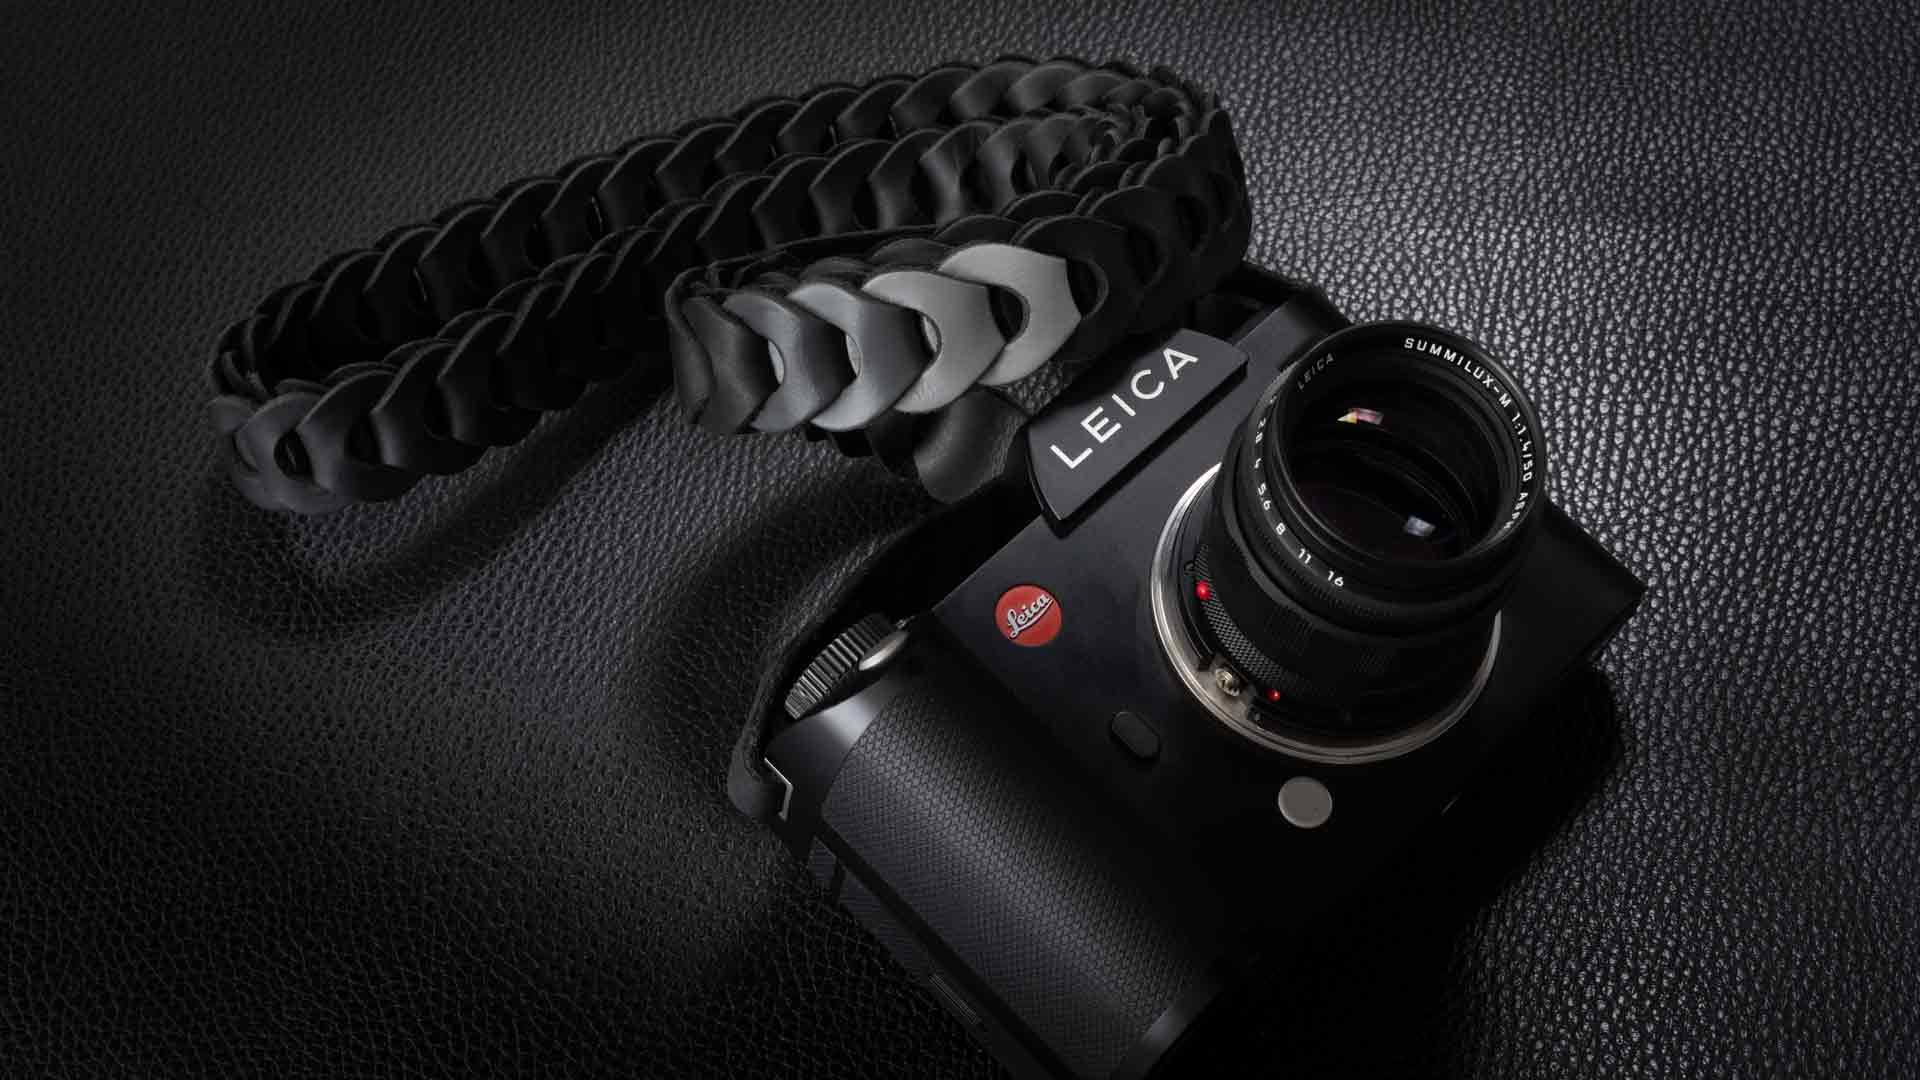 leica s strap, leather camera strap, handmade leather camera strap, vintage camera straps, leica camera strap, handmade camera strap, black camera strap, mirrorless camera strap